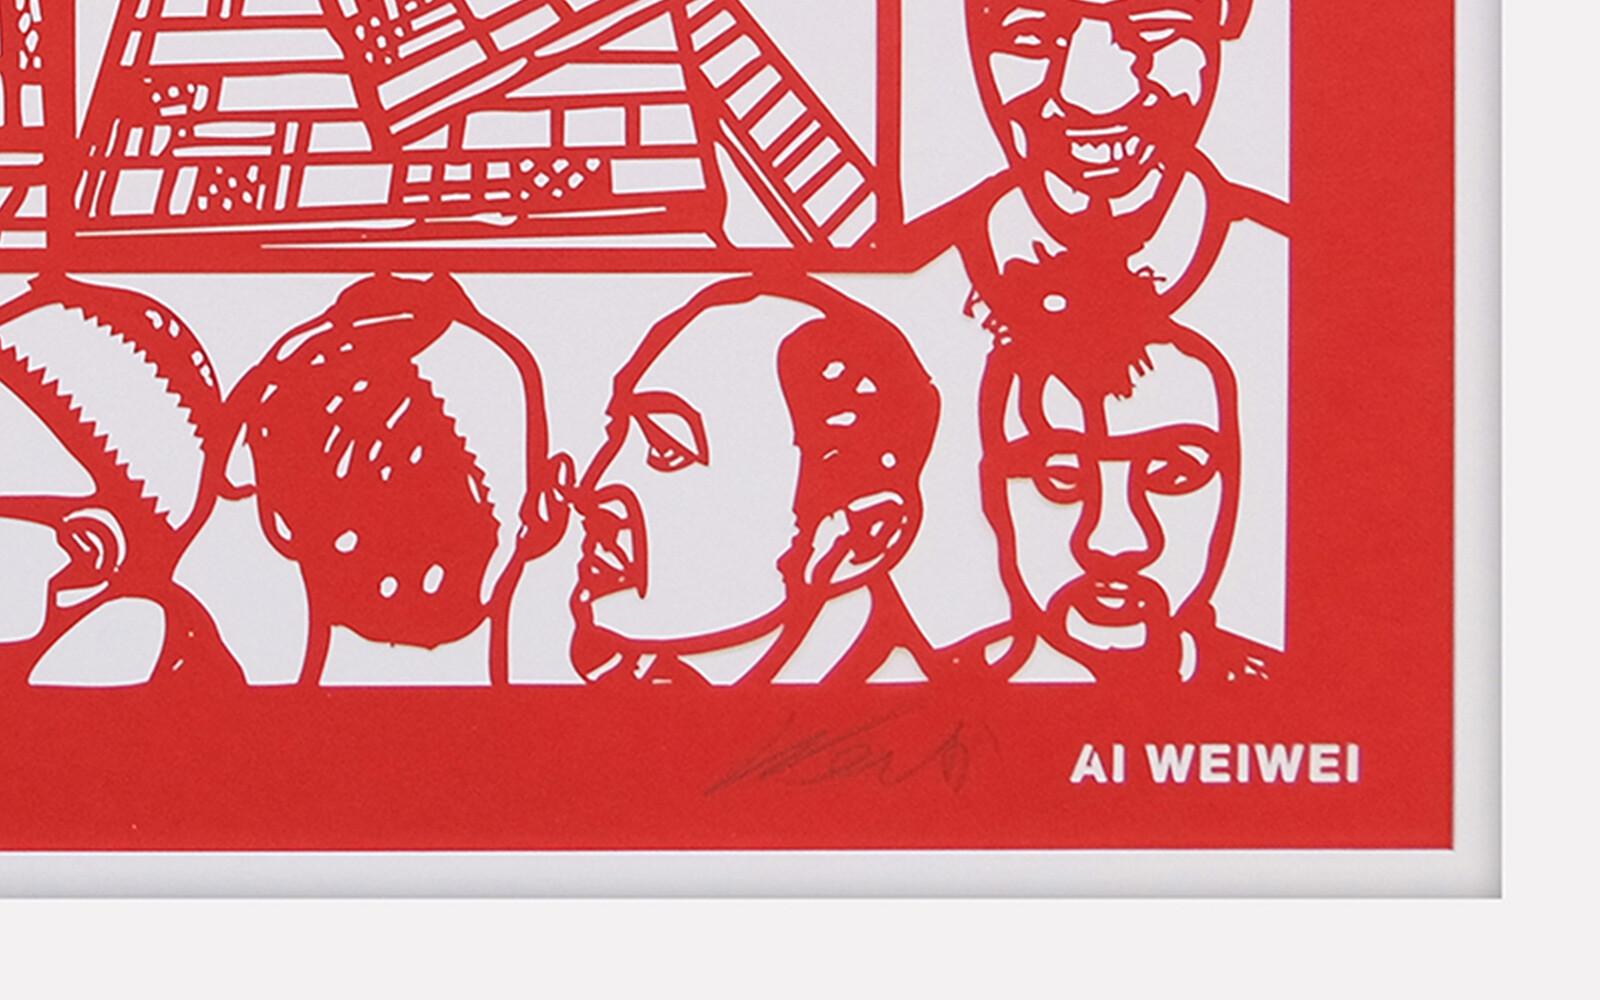 HAIR CUT - Ai Weiwei